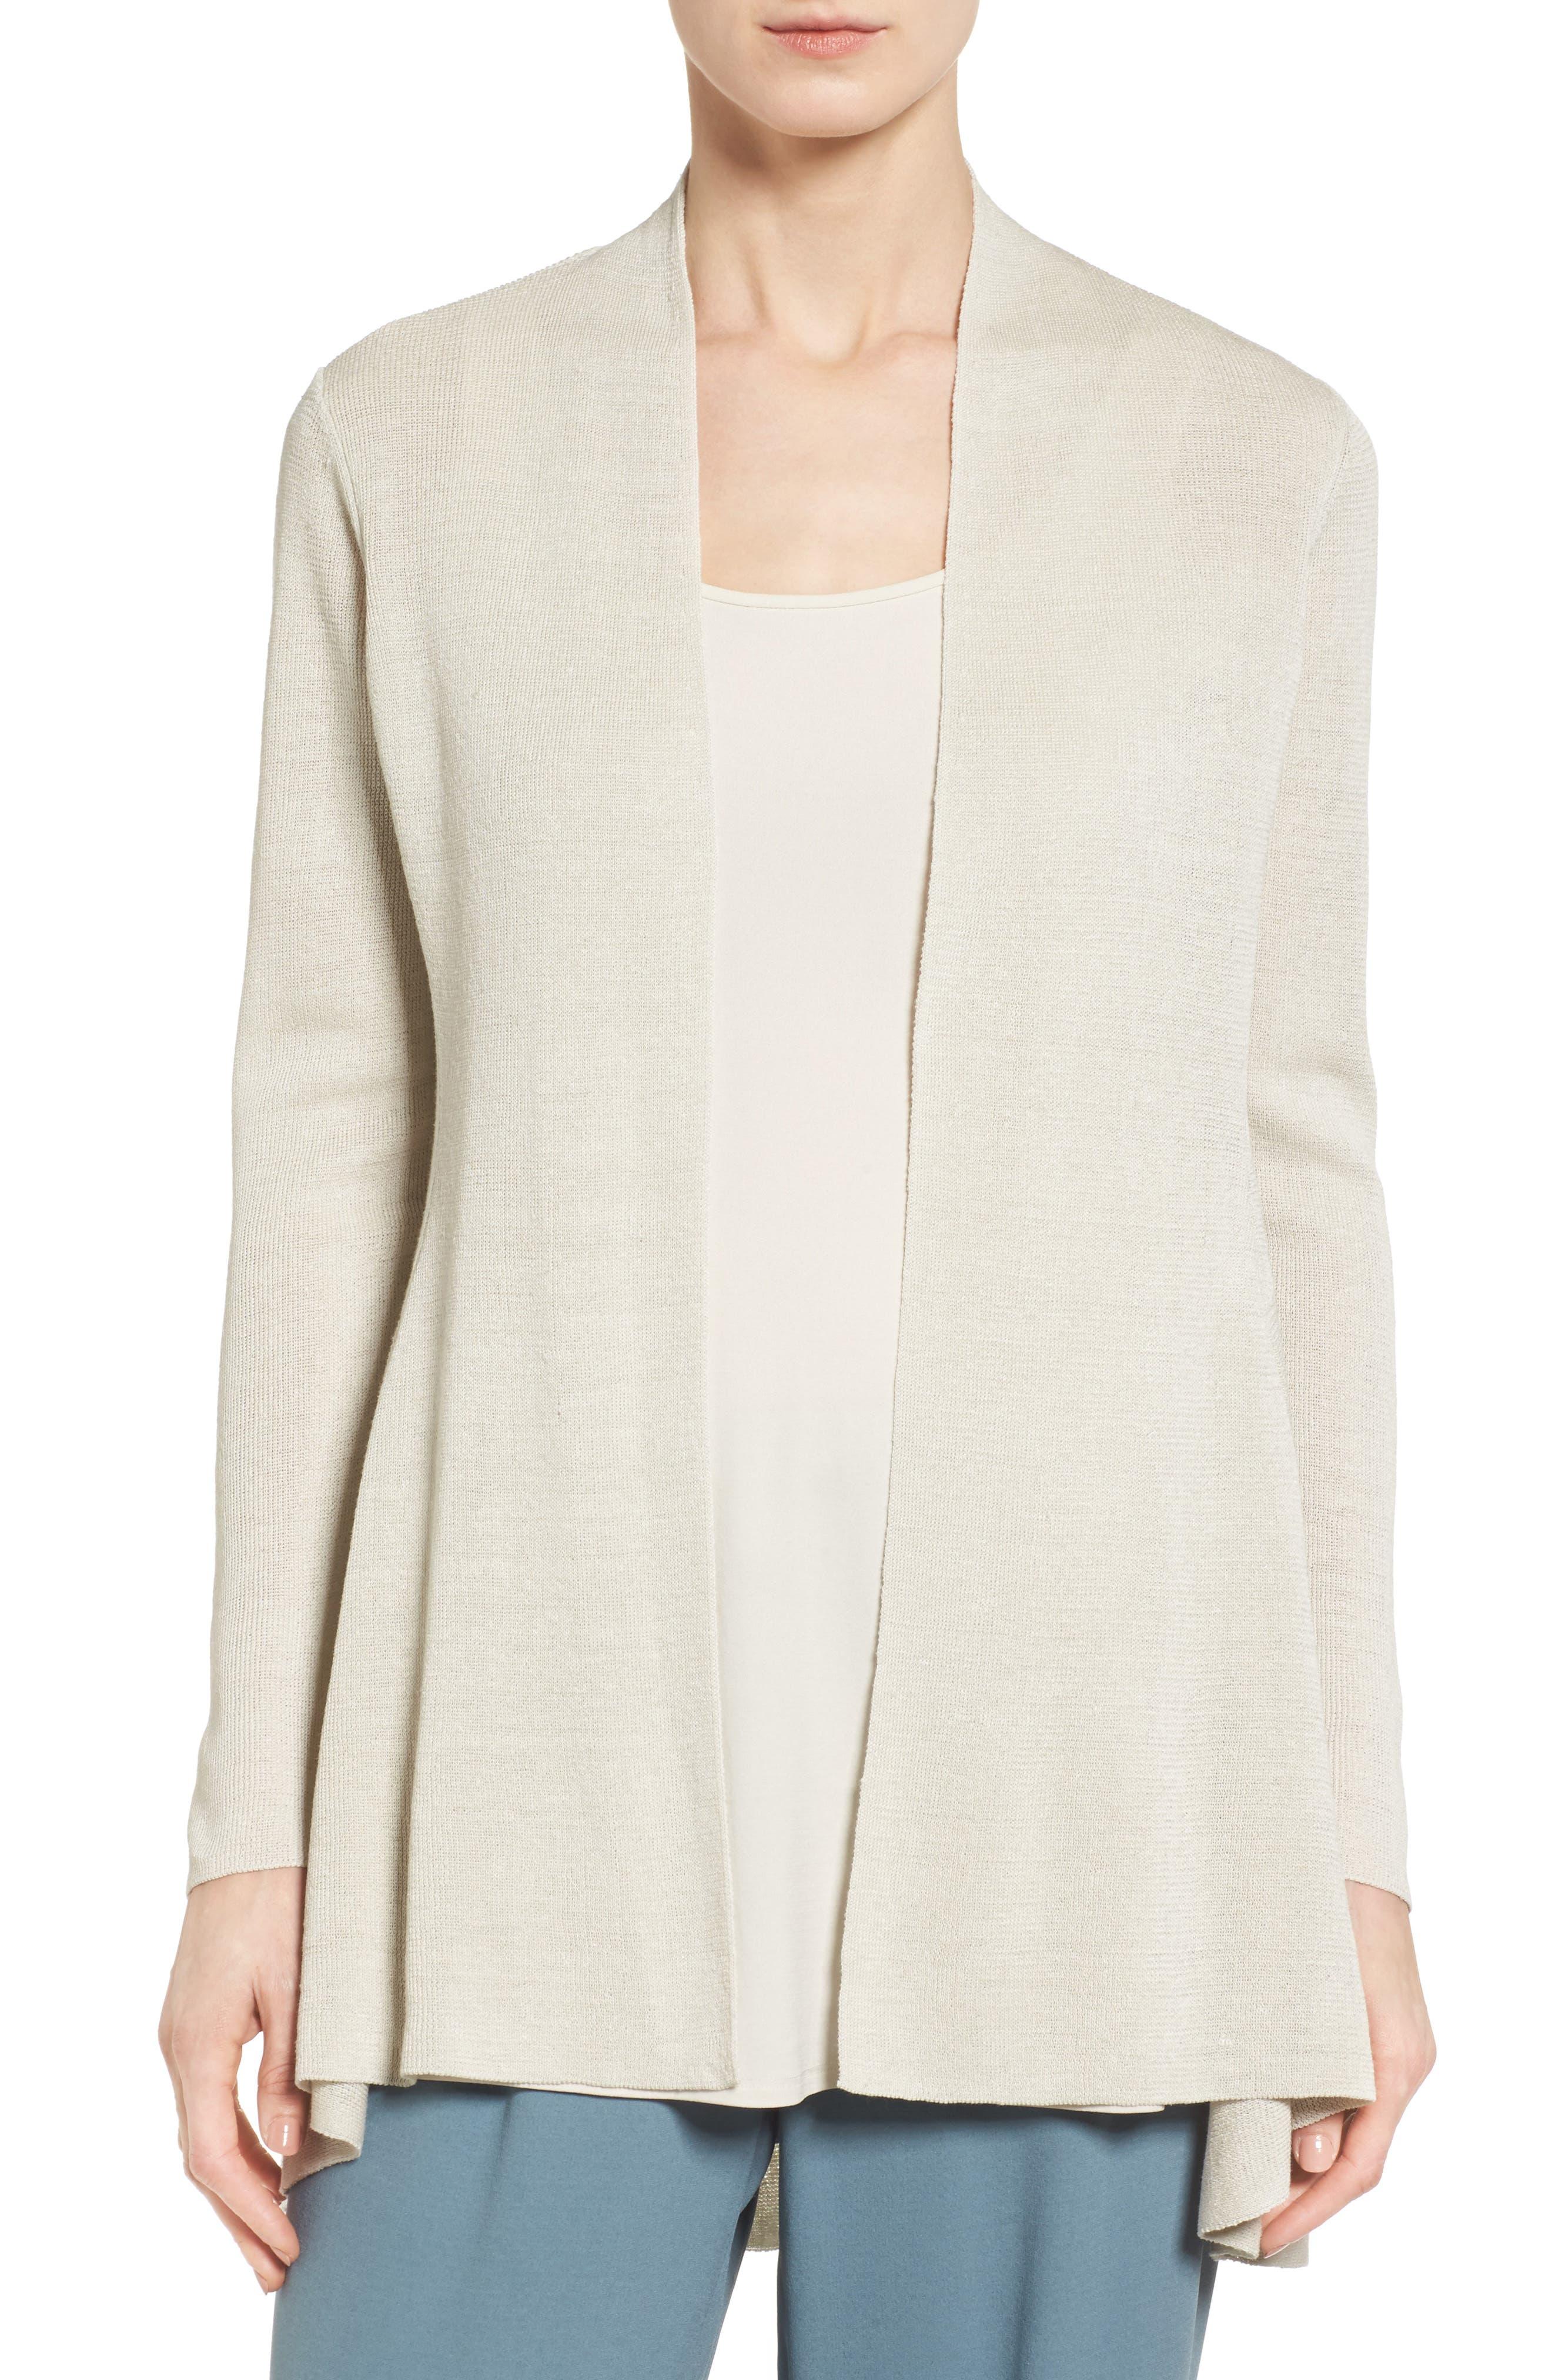 Main Image - Eileen Fisher Shaped Organic Linen Blend Cardigan (Regular & Petite)